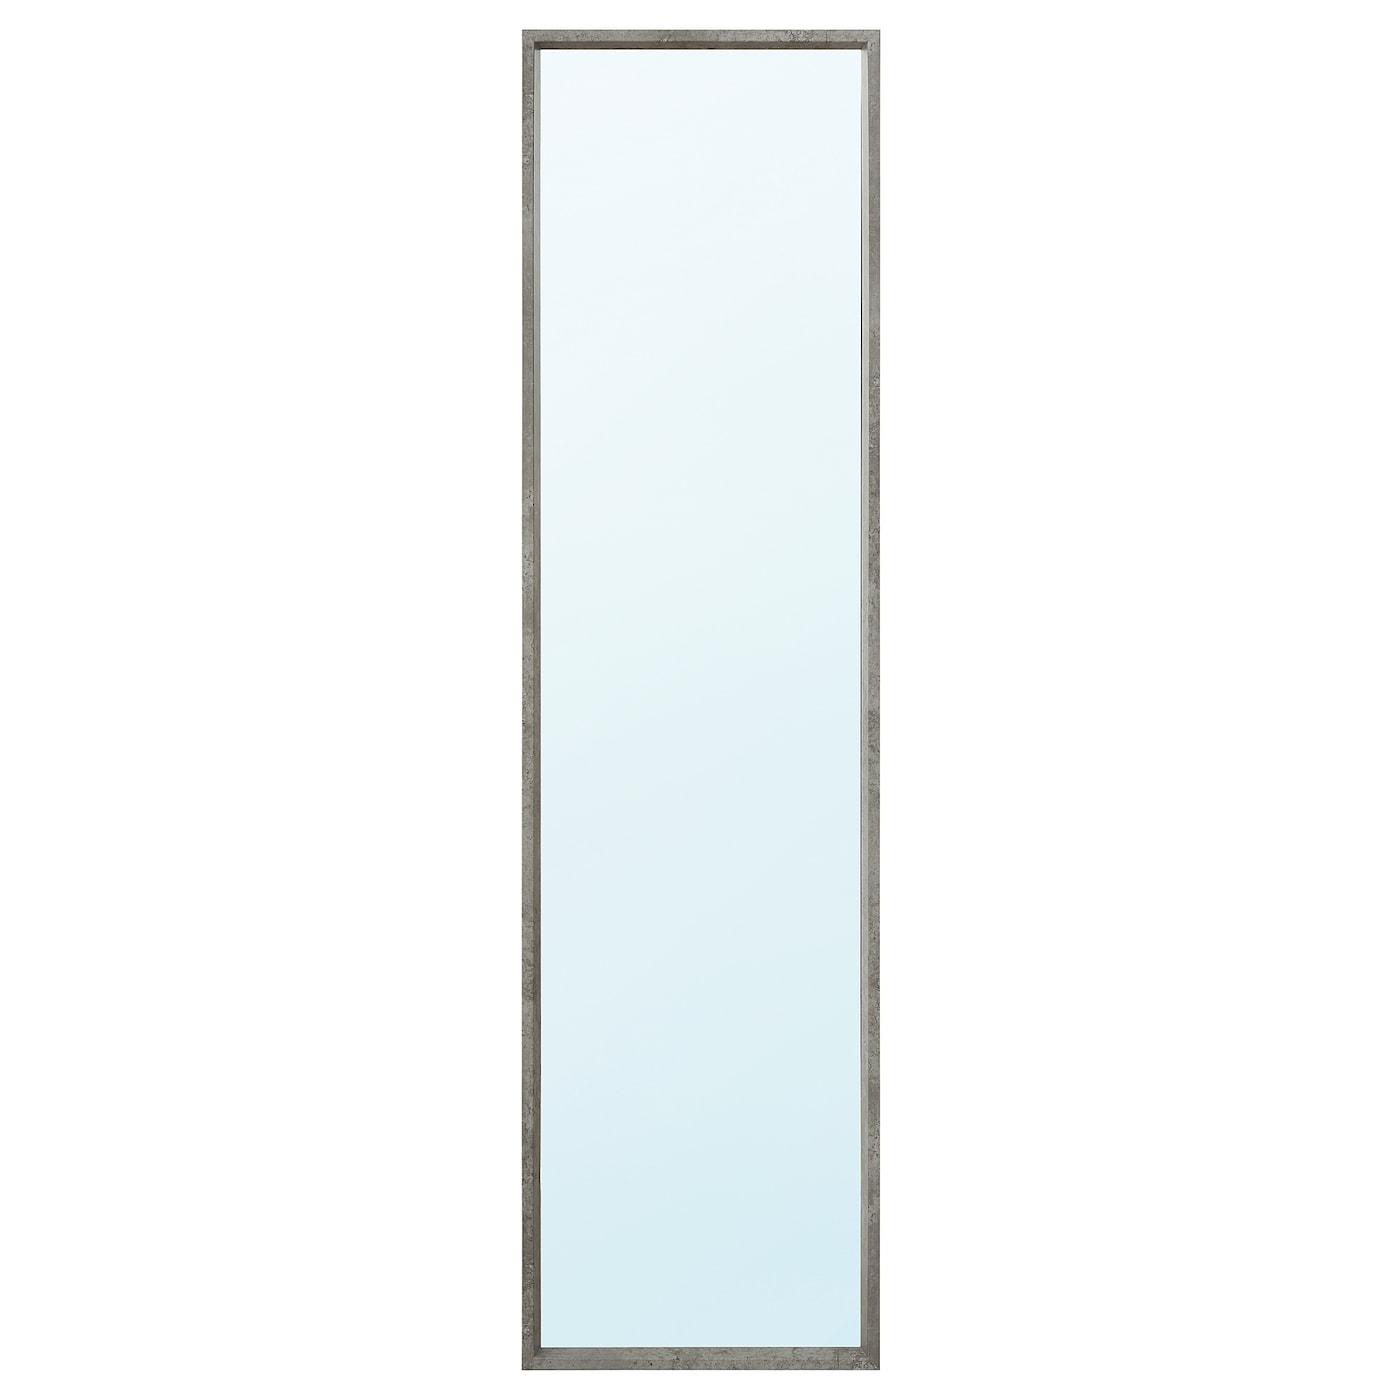 Wall Mirrors Large Wall Mirrors Decorative Wall Mirrors Ikea